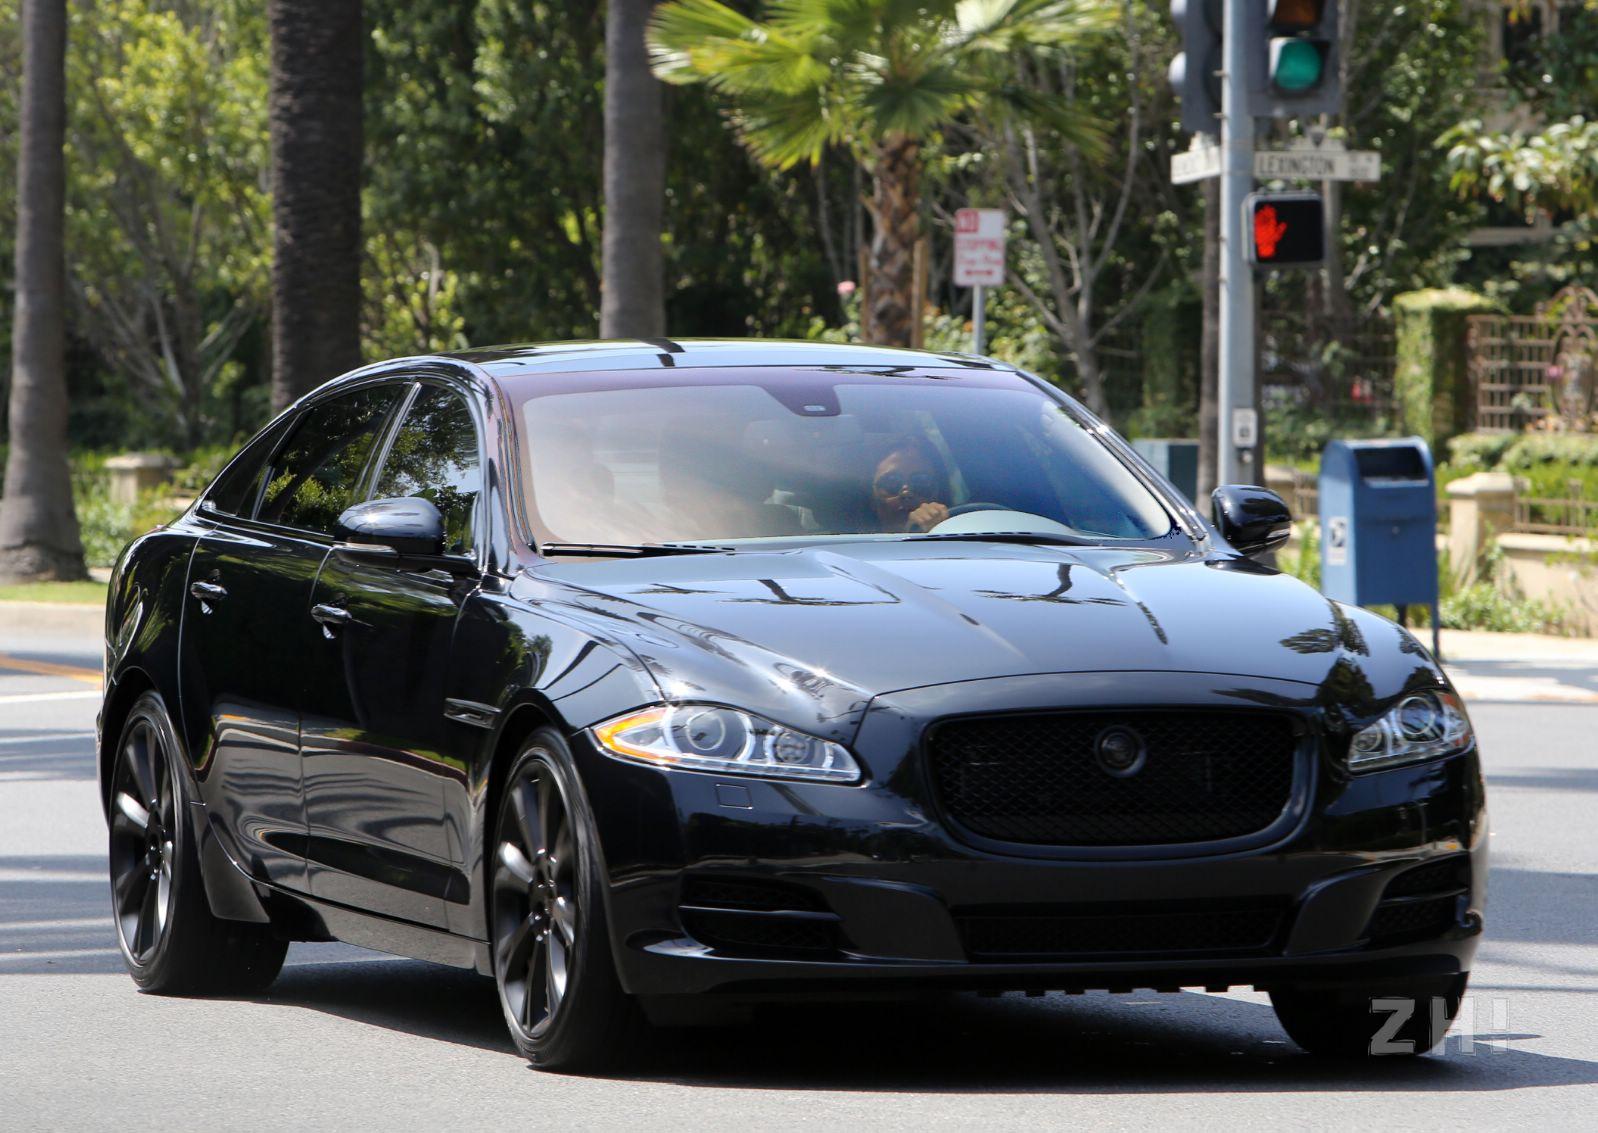 Victoria Beckham's Beastly Black Jaguar XJ - GTspirit - photo#28